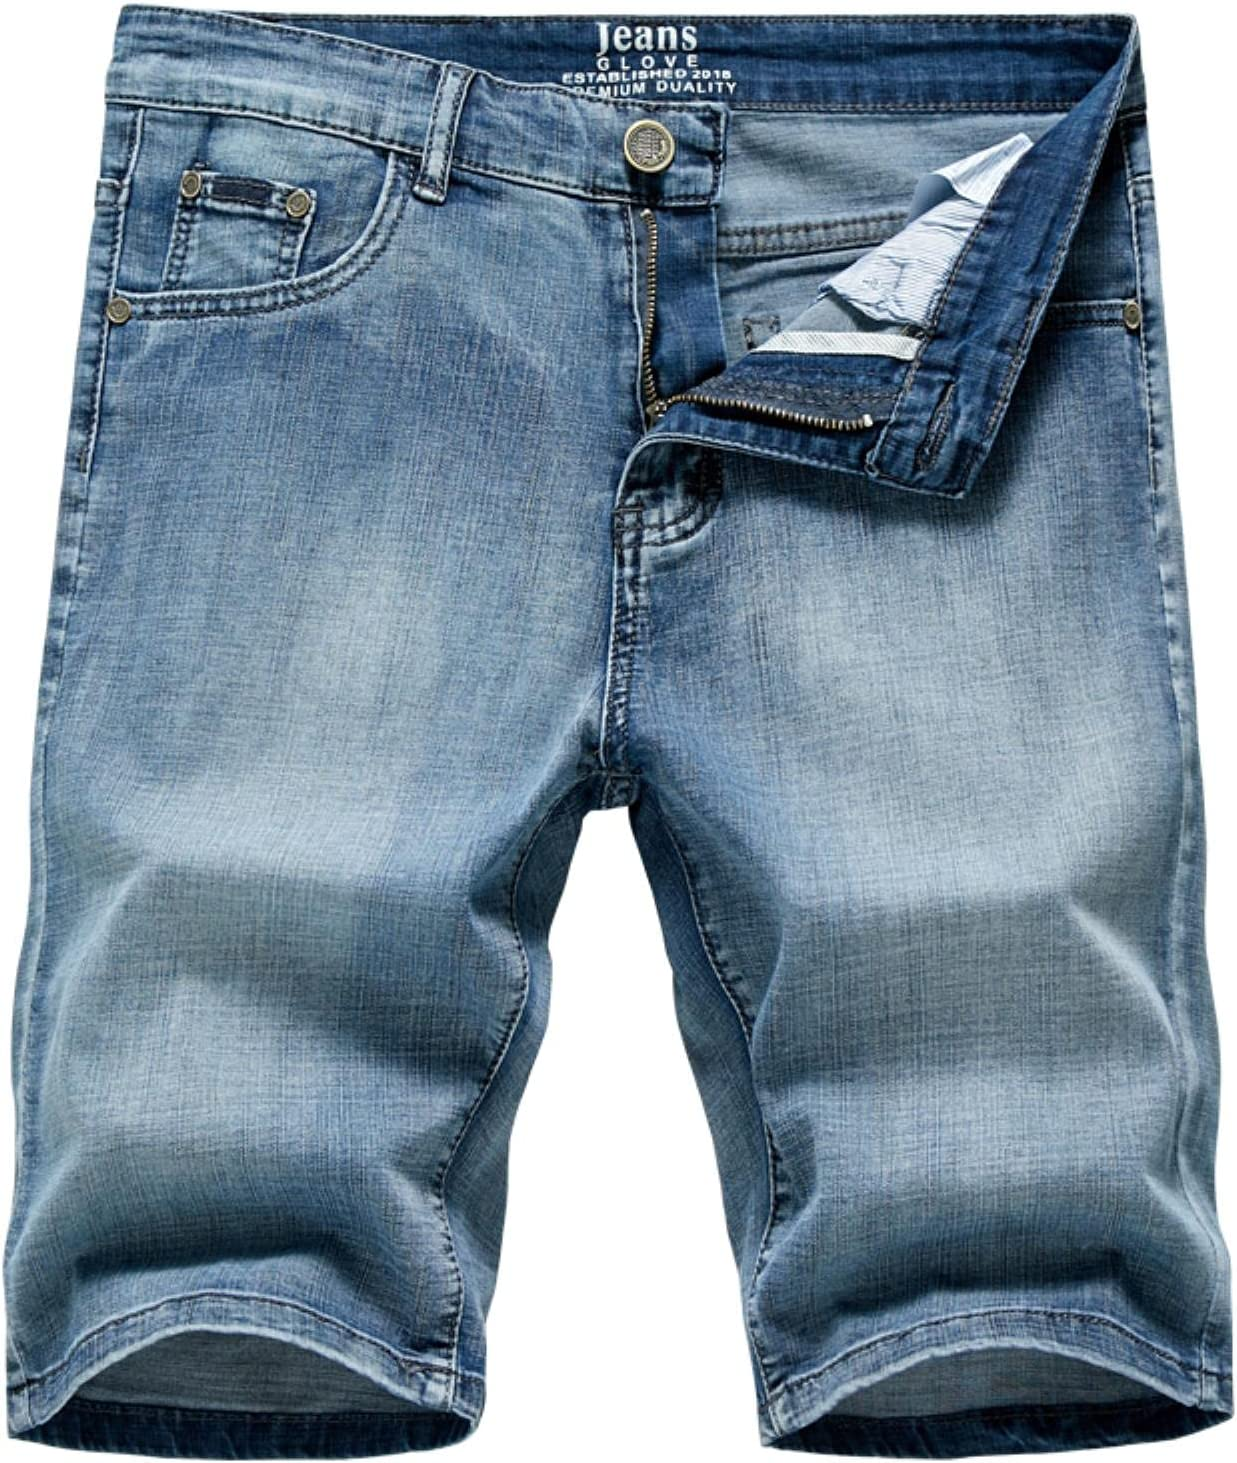 WoJogom 2021 Summer Men's Denim Shorts Classic Black Blue Thin Section Fashion Slim Business Casual Jeans Shorts